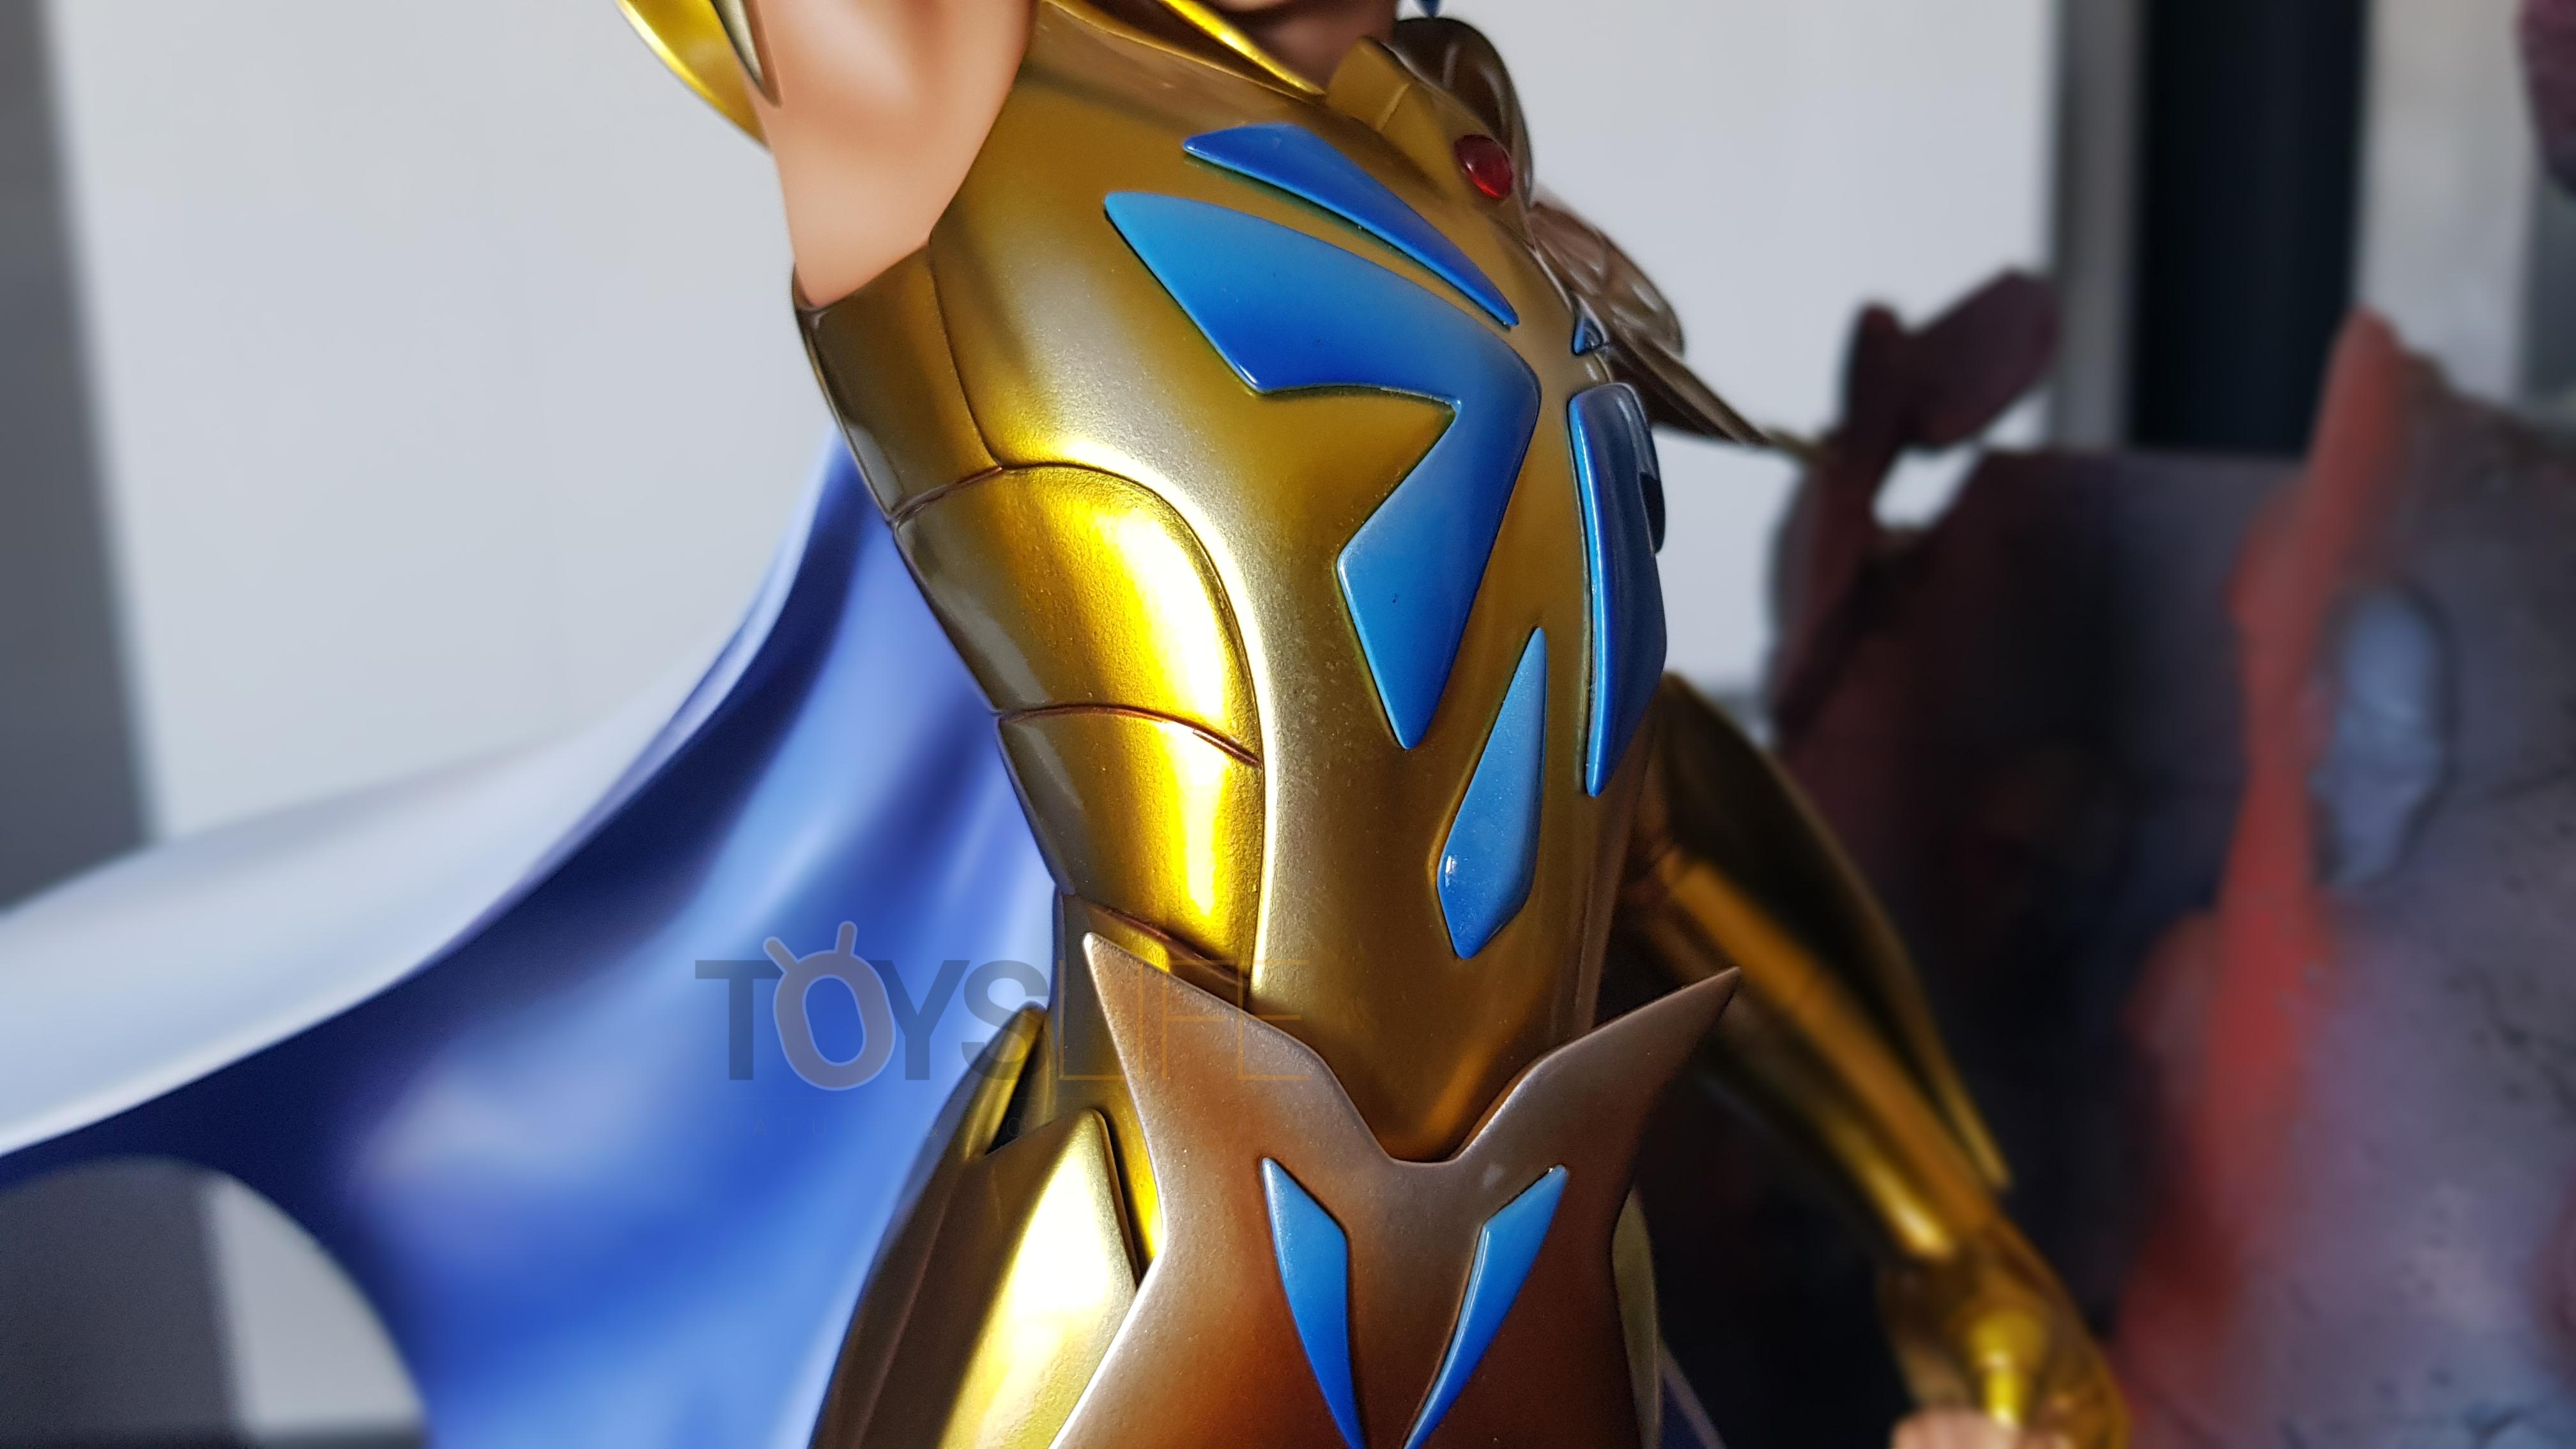 tsume-art-saint-seiya-gold-saint-death-mask-statue-toyslife-review-20